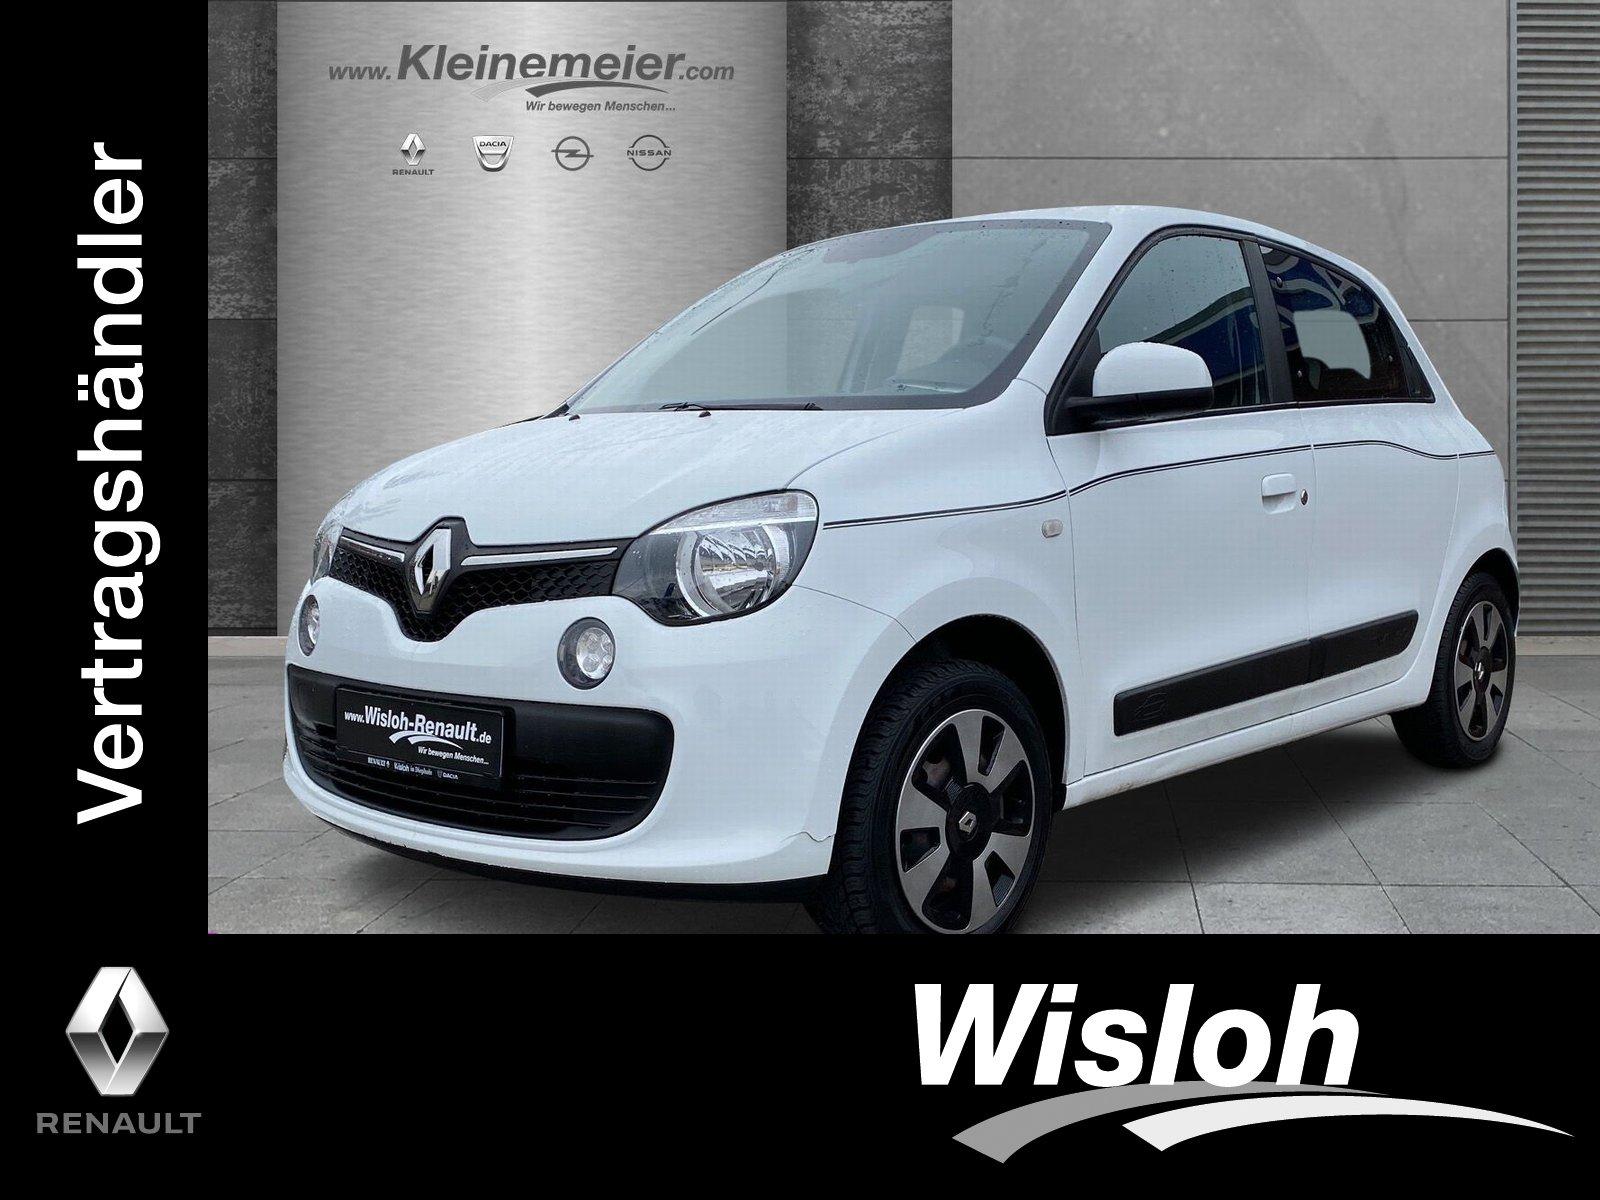 Renault Twingo 1.0 SCe 70 eco² Dynamique ENERGY/Klima, Jahr 2015, Benzin